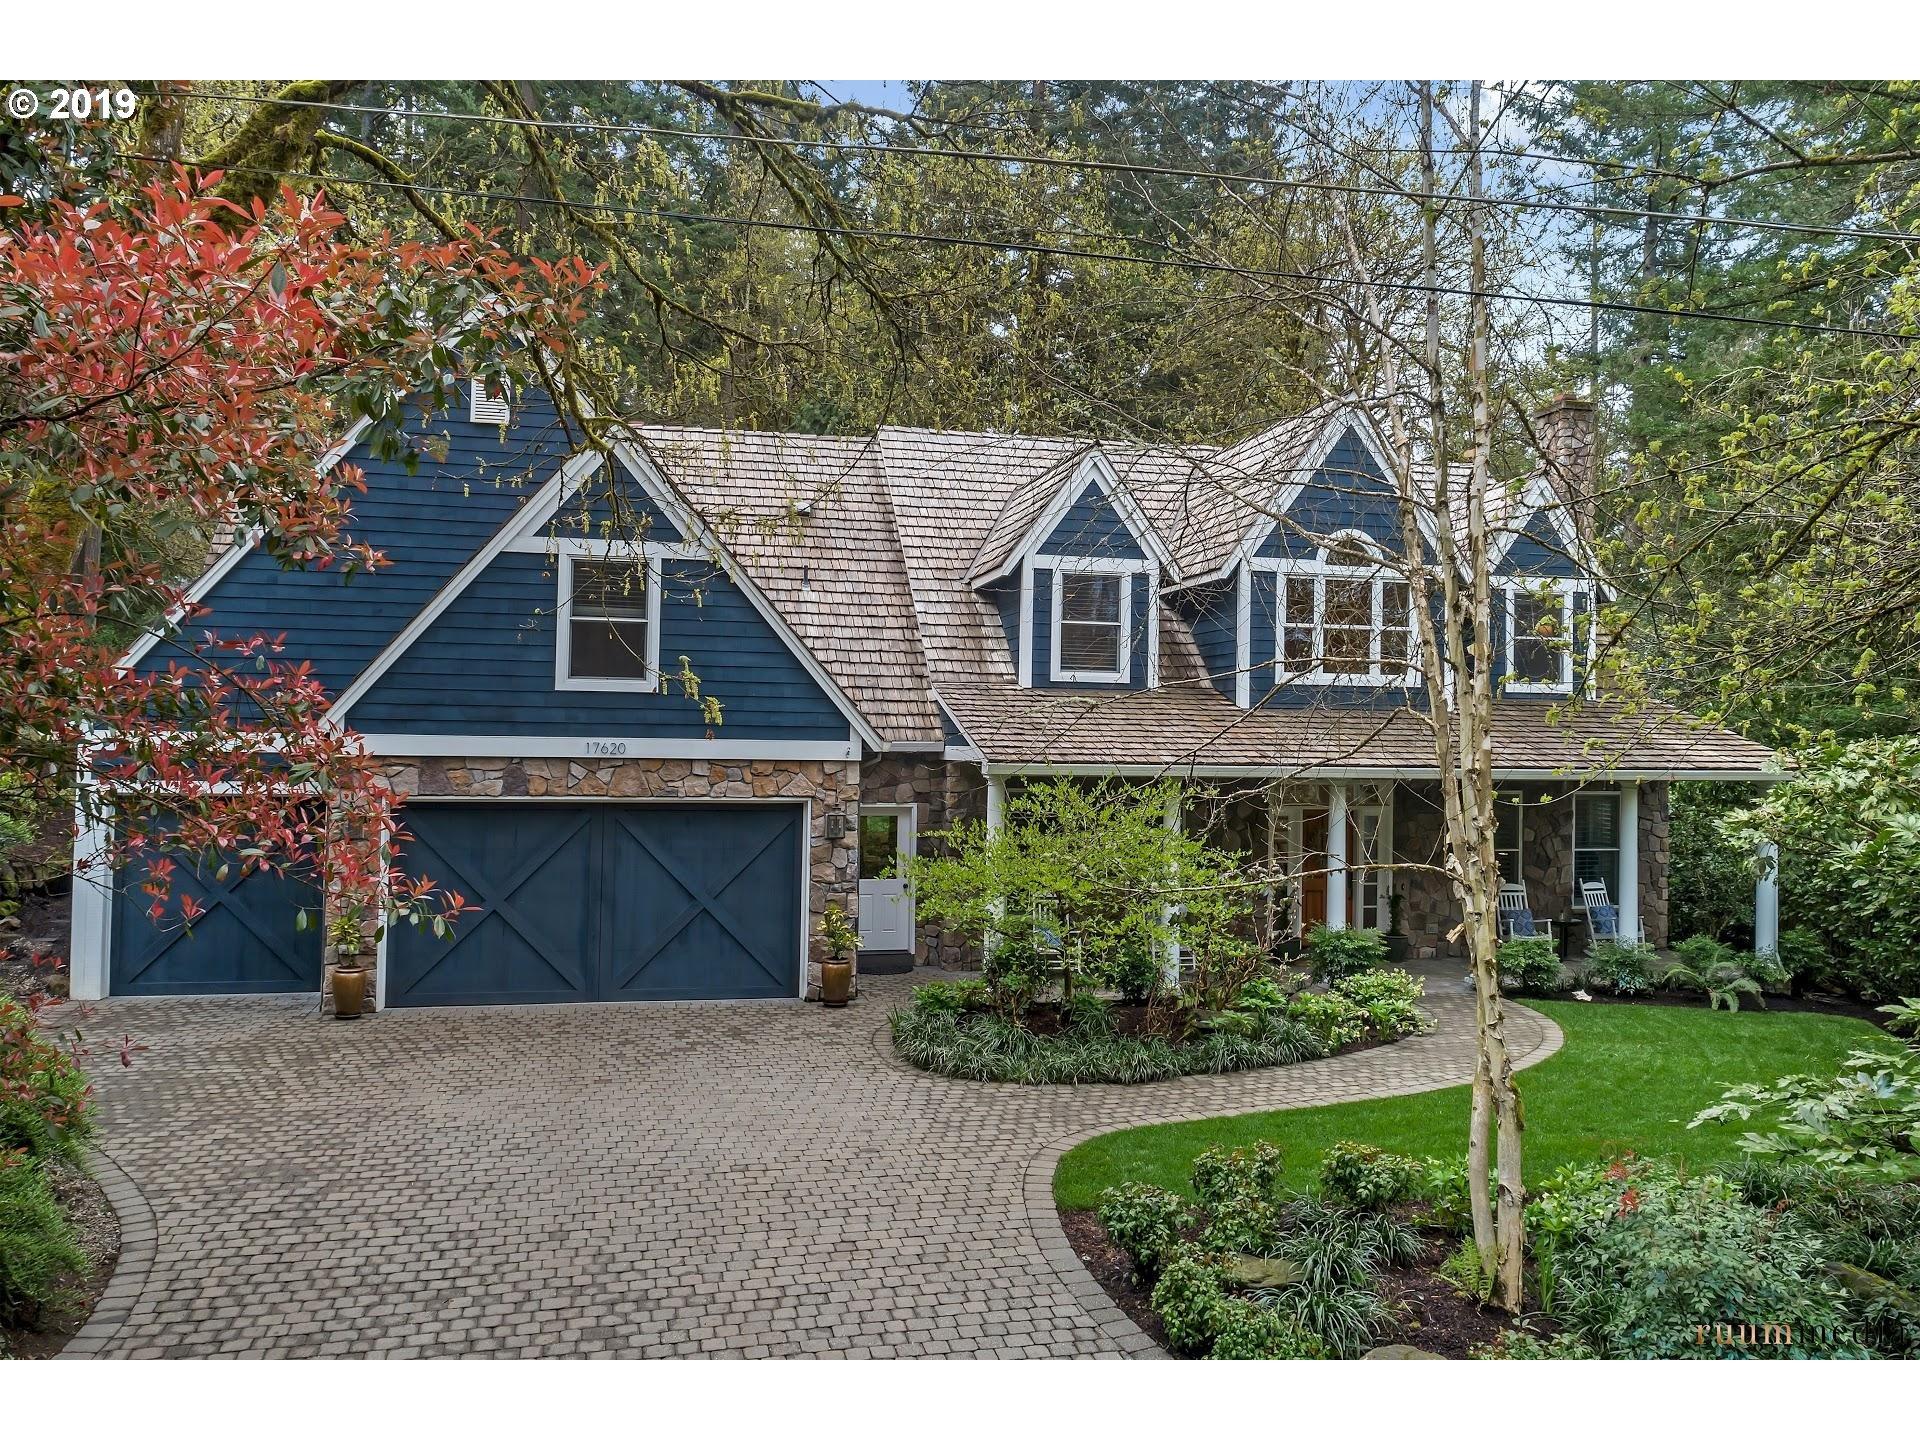 17620 BLUE HERON RD, Lake Oswego OR 97034